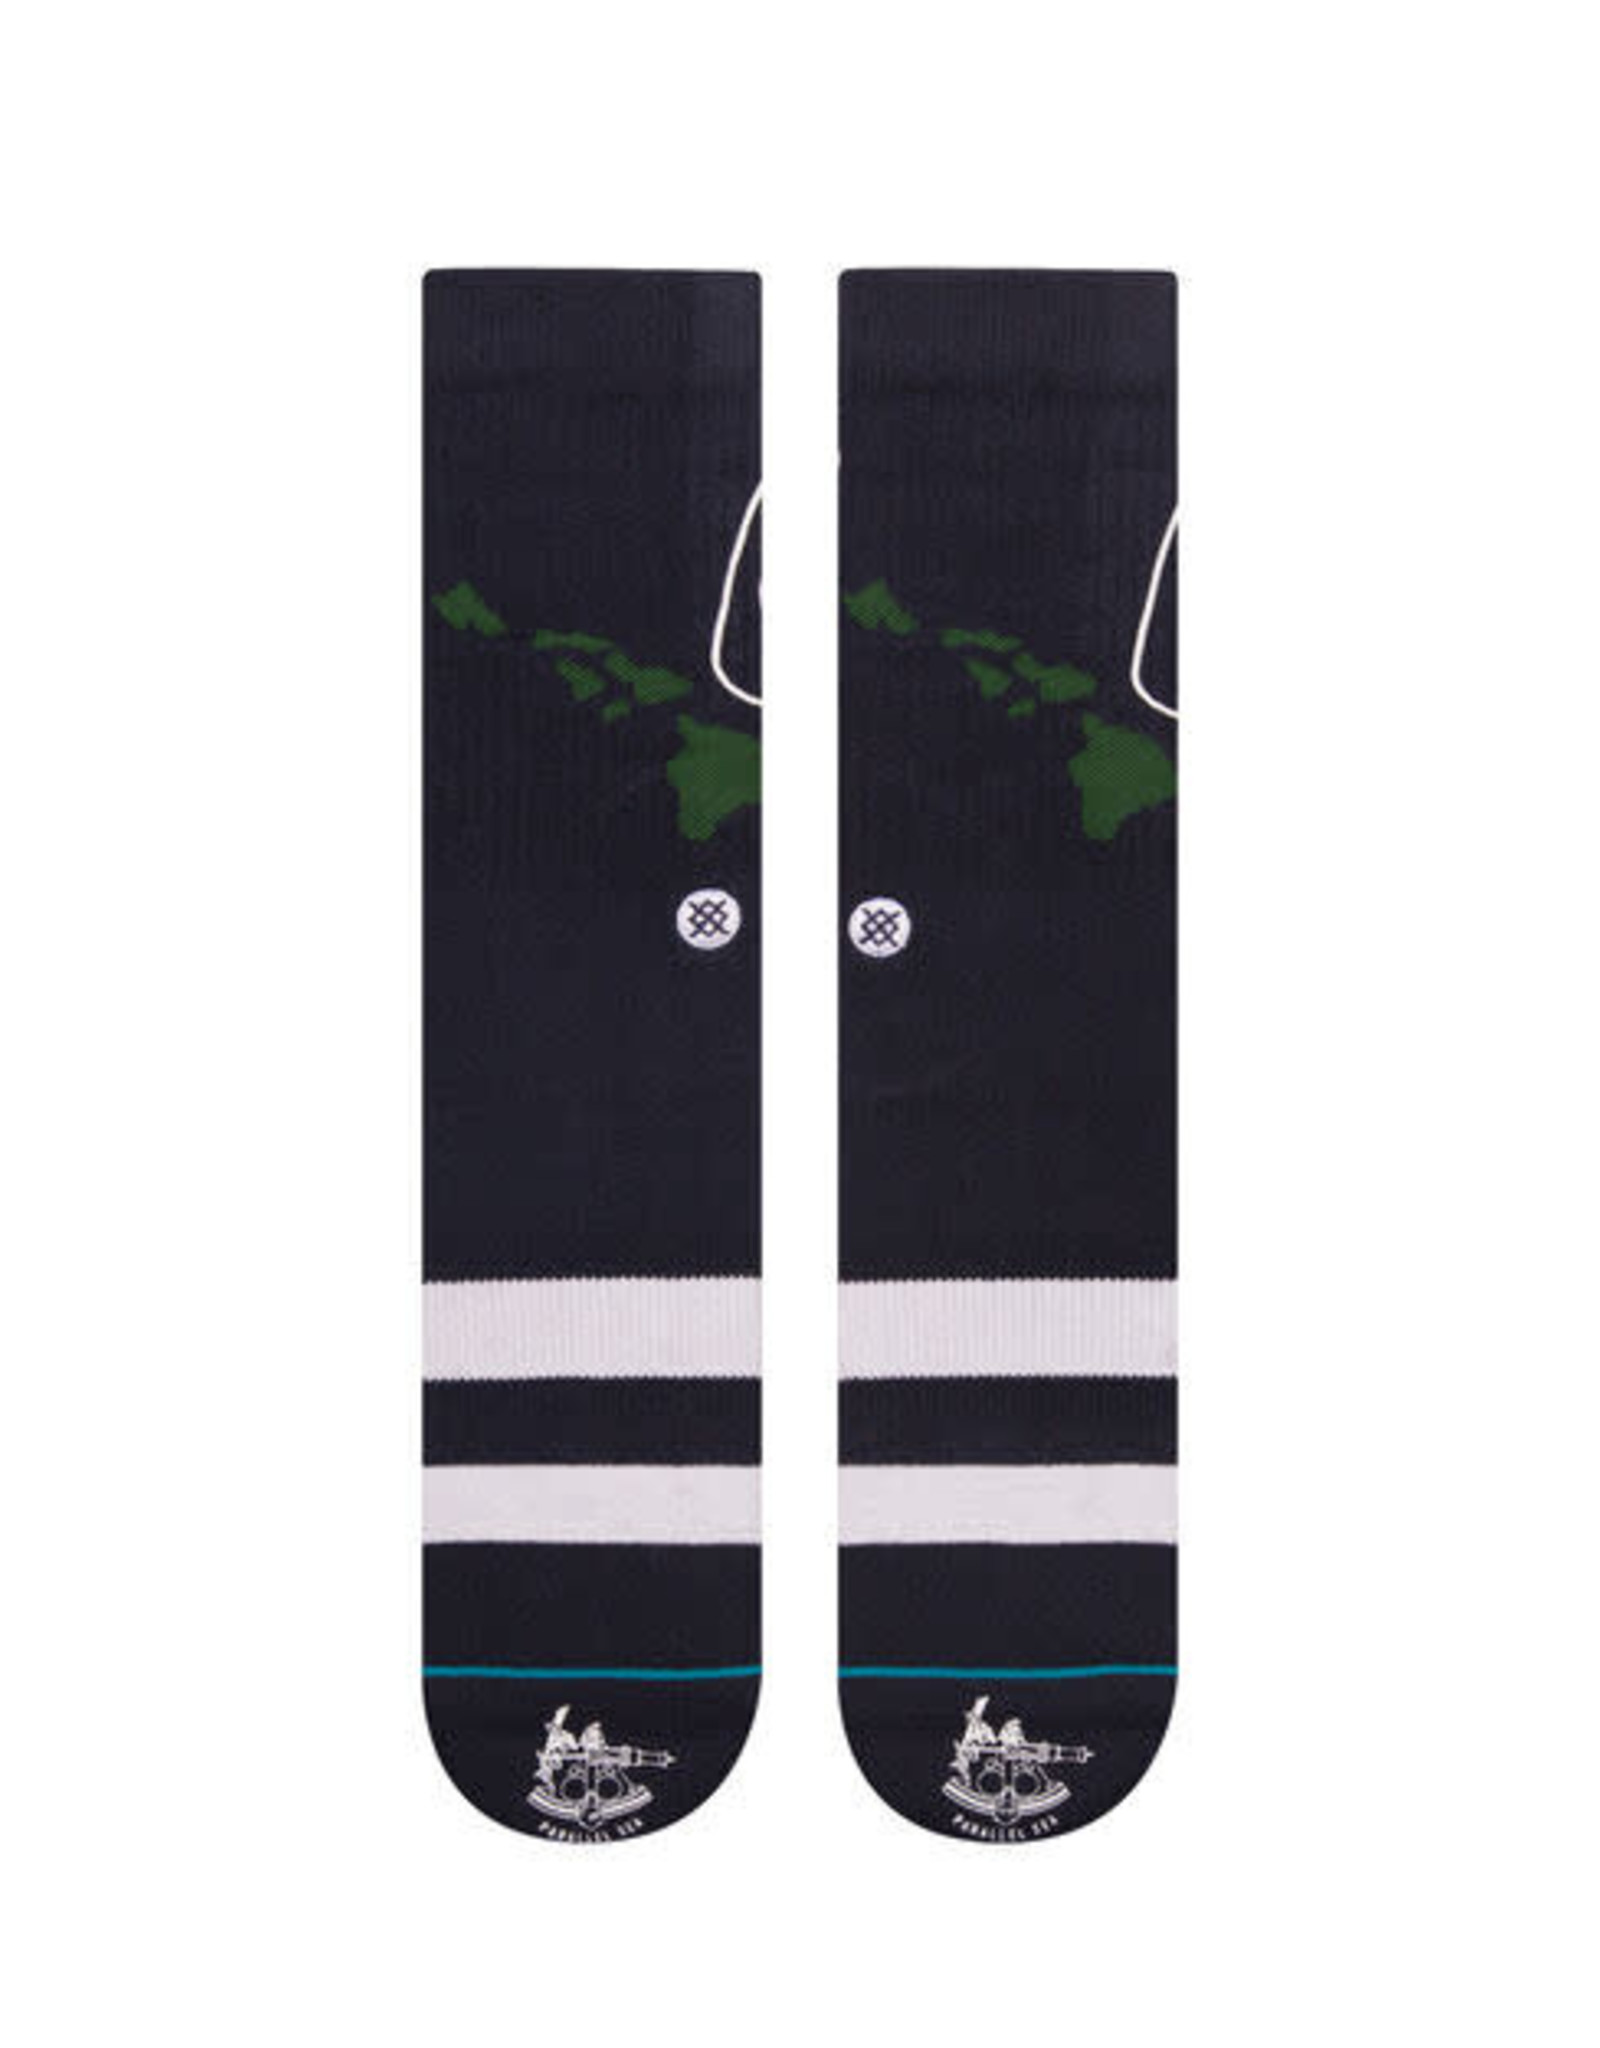 STANCE - Swell Socks